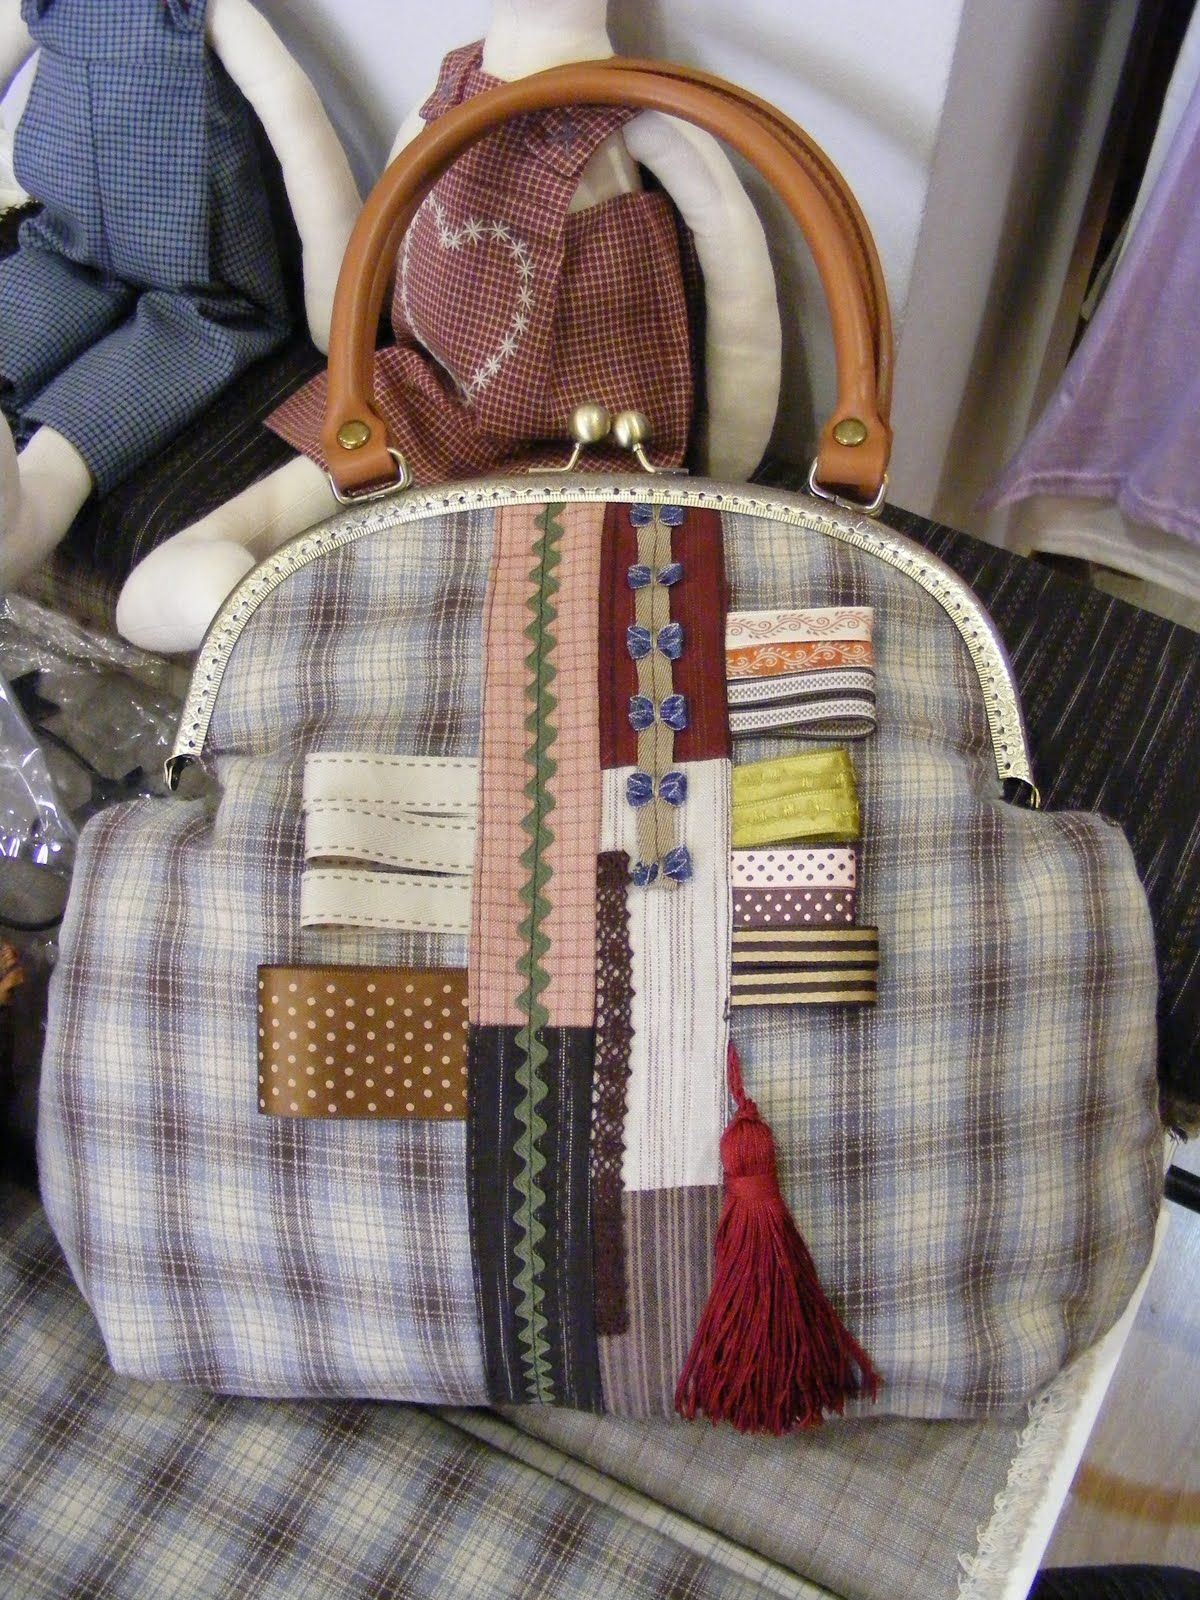 CLUTCHES BAGS BESSONES Bolsos PATCH Pinterest amp; BOLSO JAPONES fzqq6wxaS